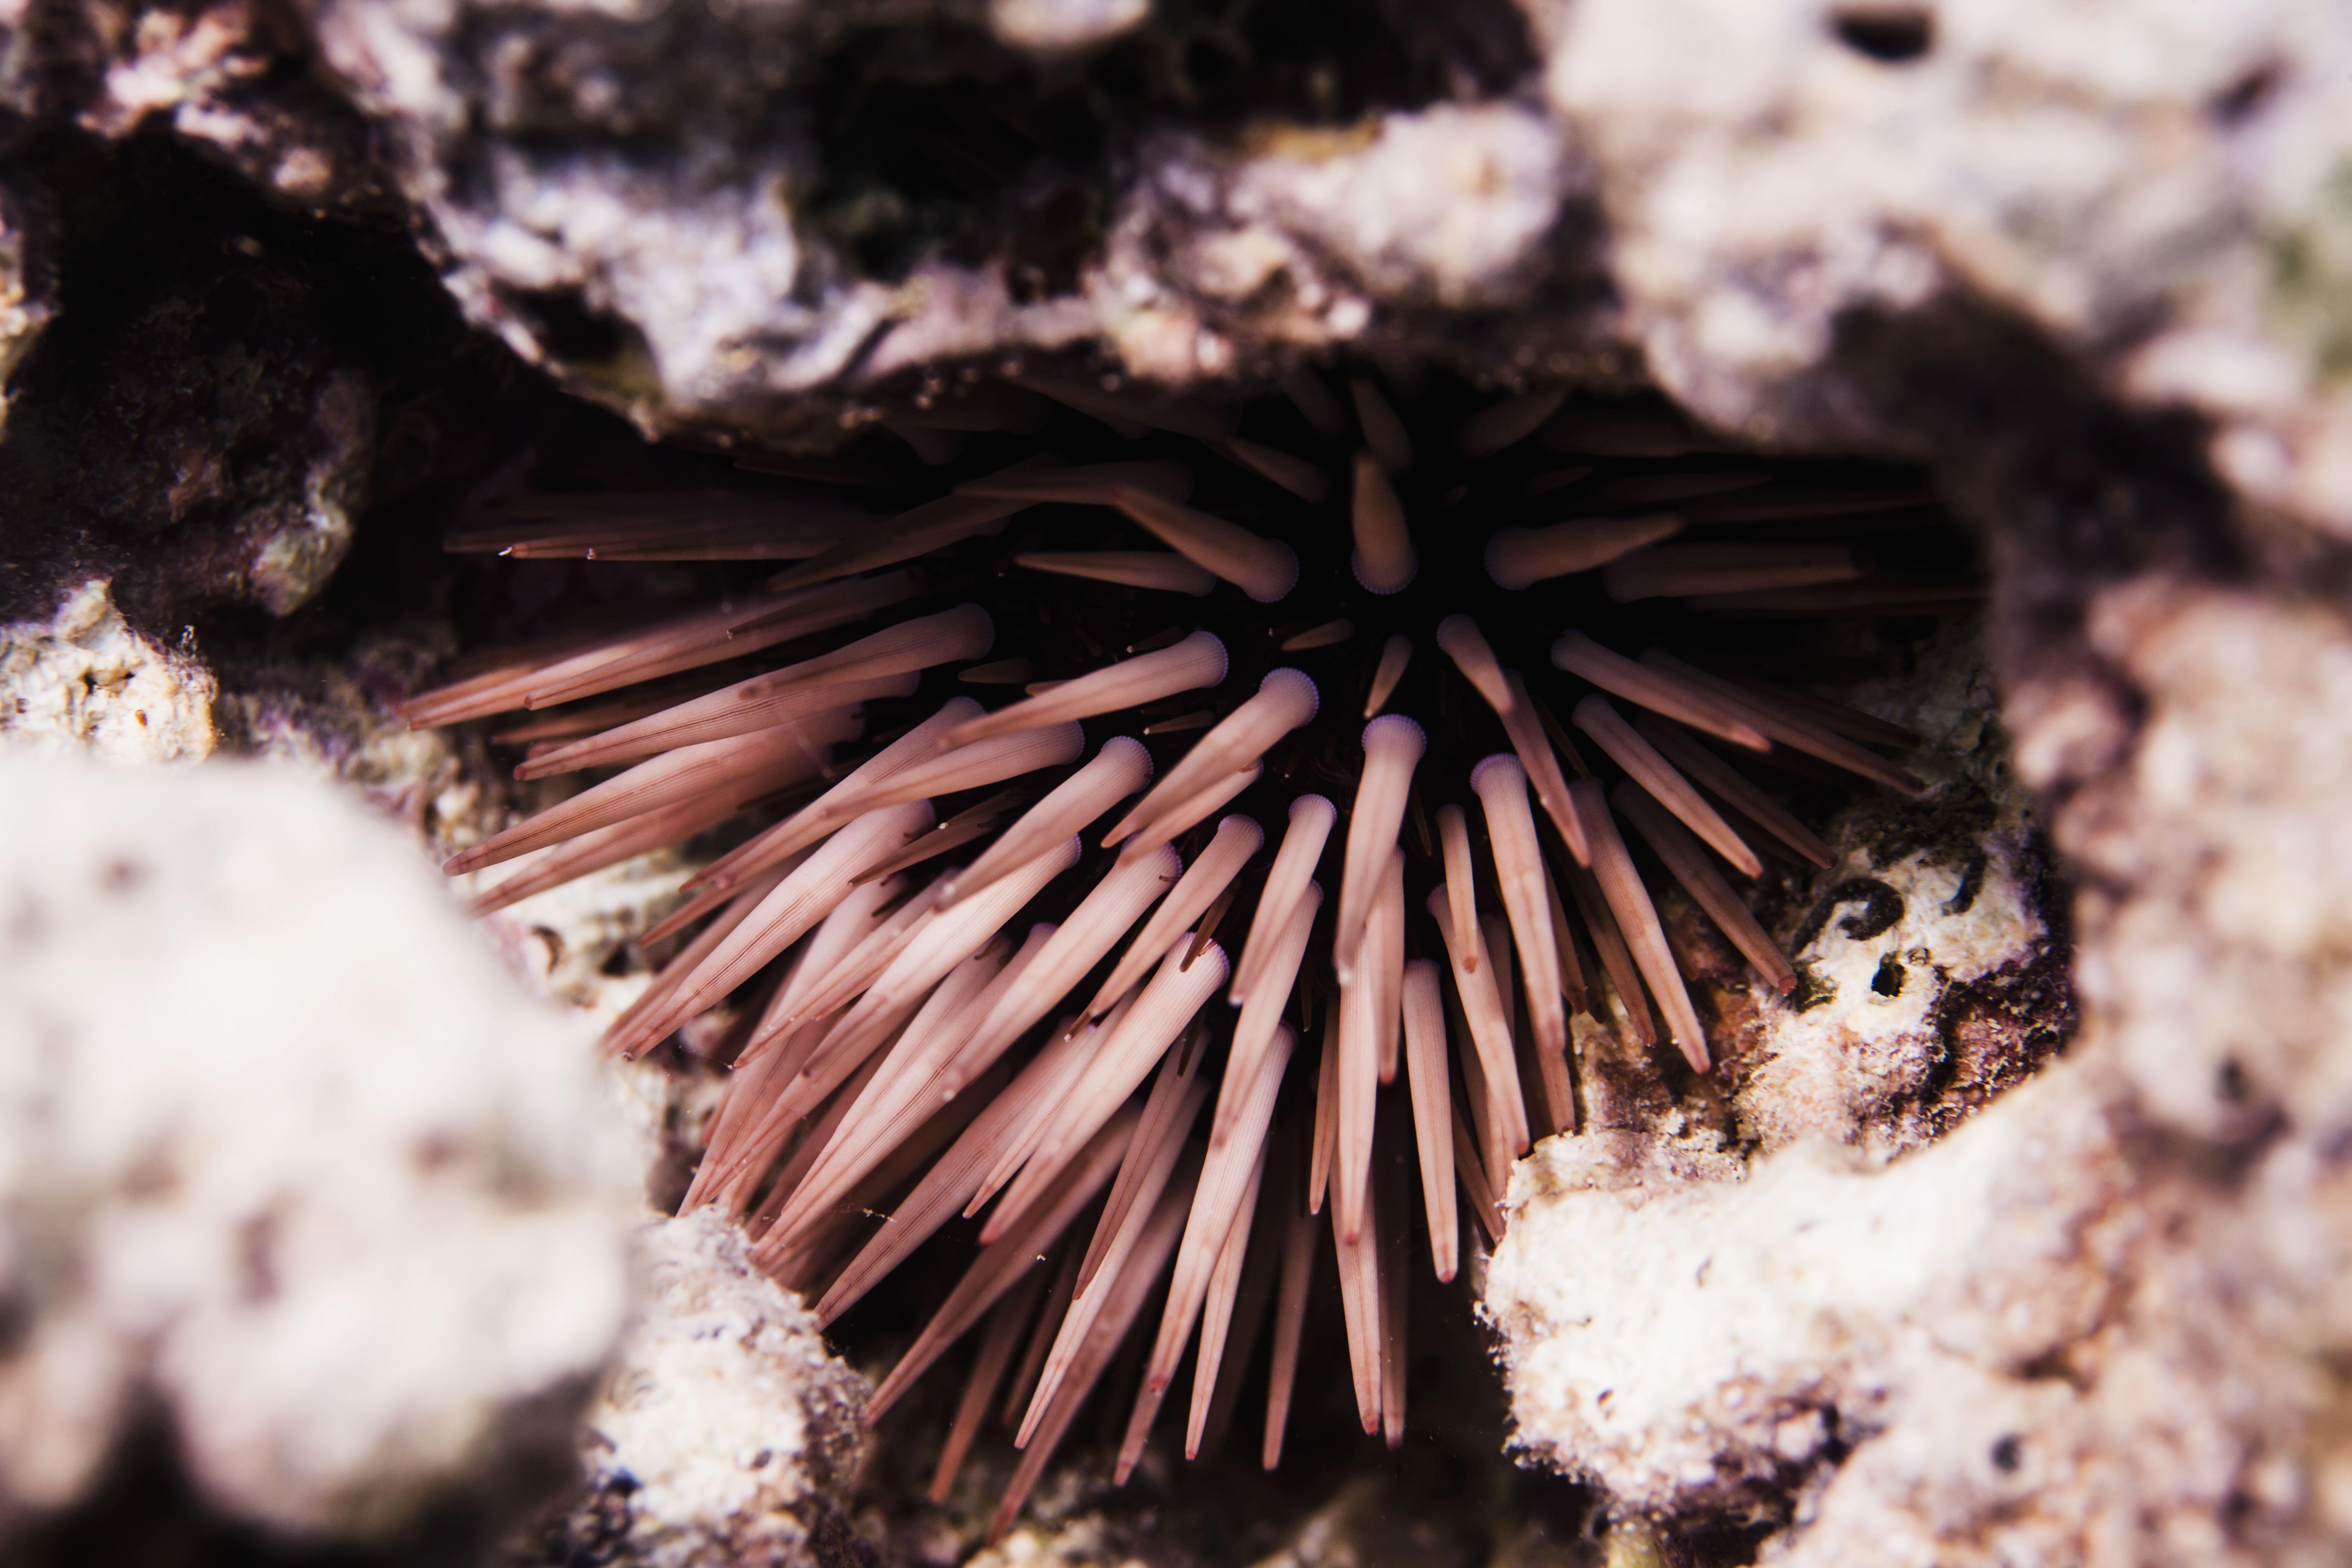 Erizo de mar pálido y aburrido (Echinometra mathaei)